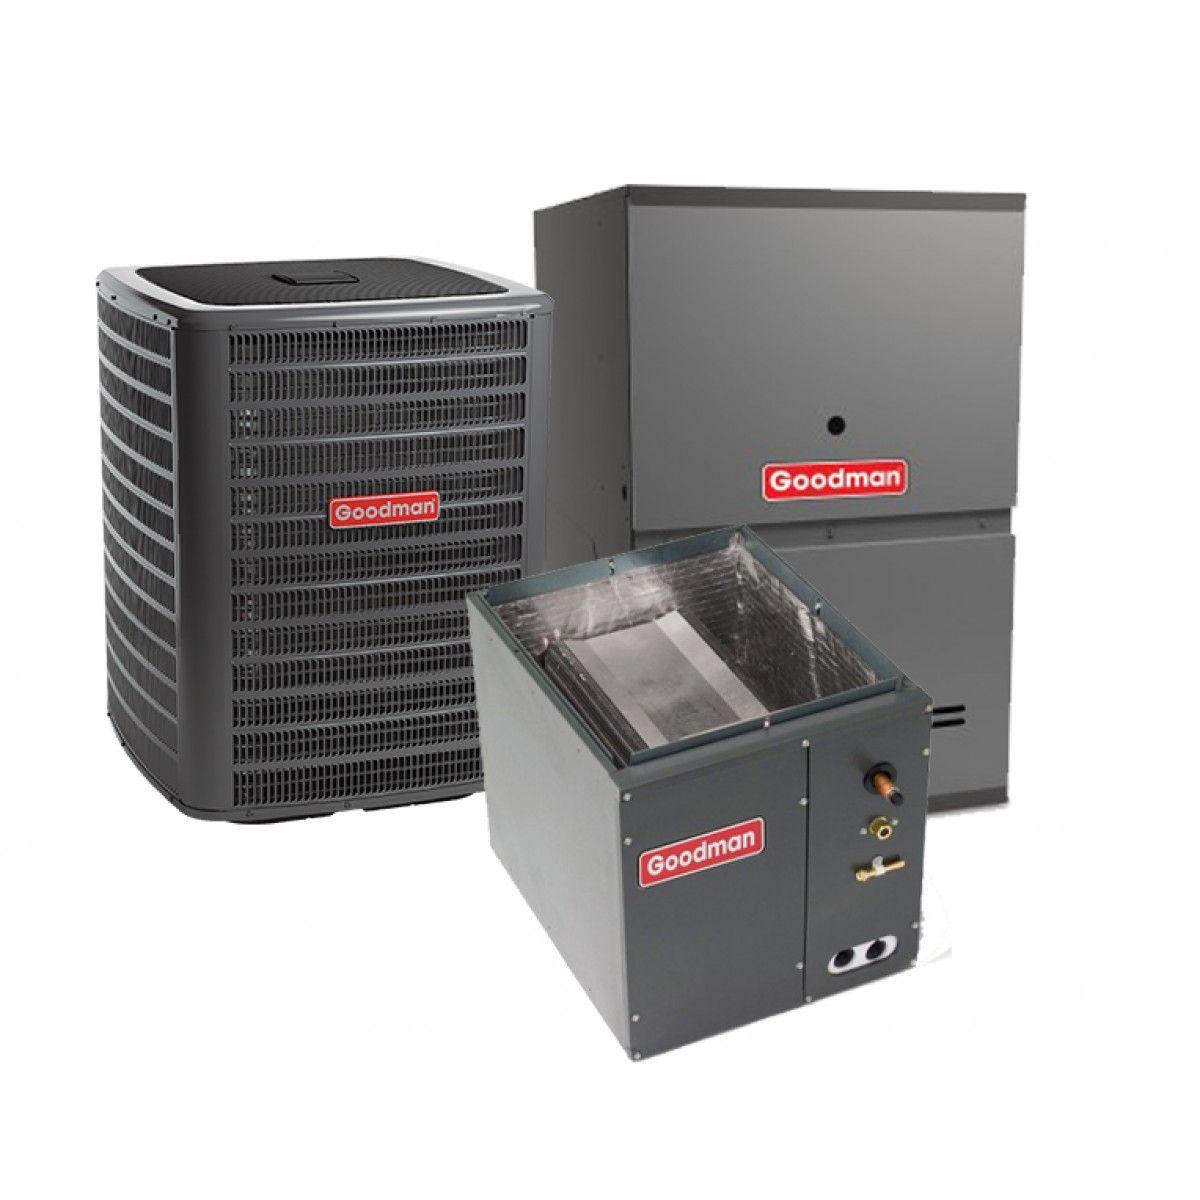 Goodman 15 Ton 13 Seer 80 Efficient 60000 Btu Single Stage Gas Air Handler Circuit Board Conditioner Furnace